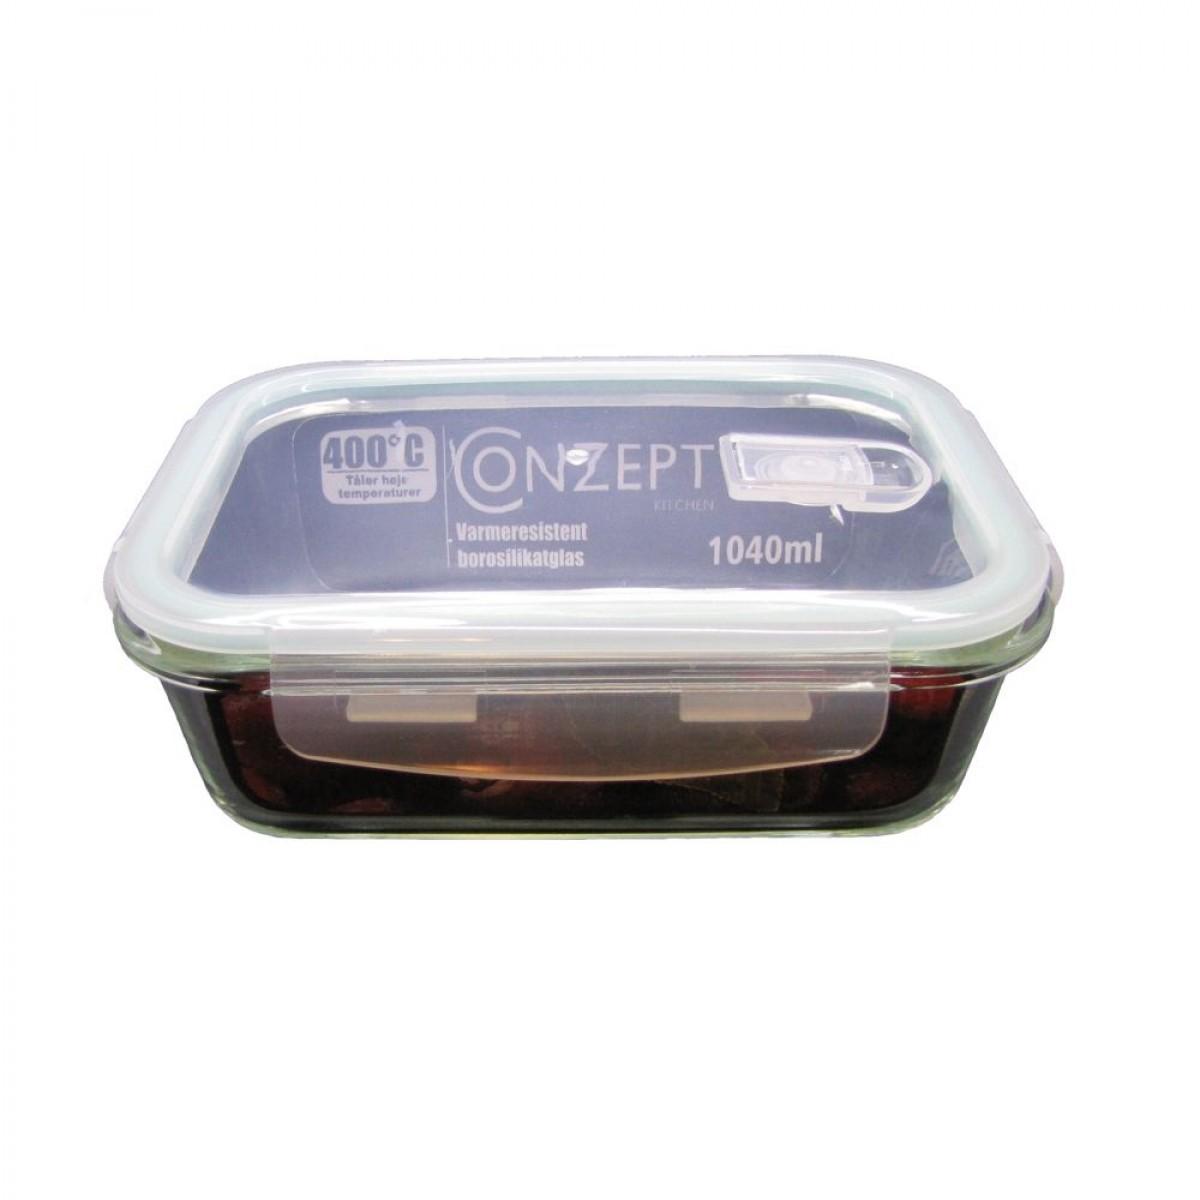 CONZEPT Glasopbevaring 1040 ml